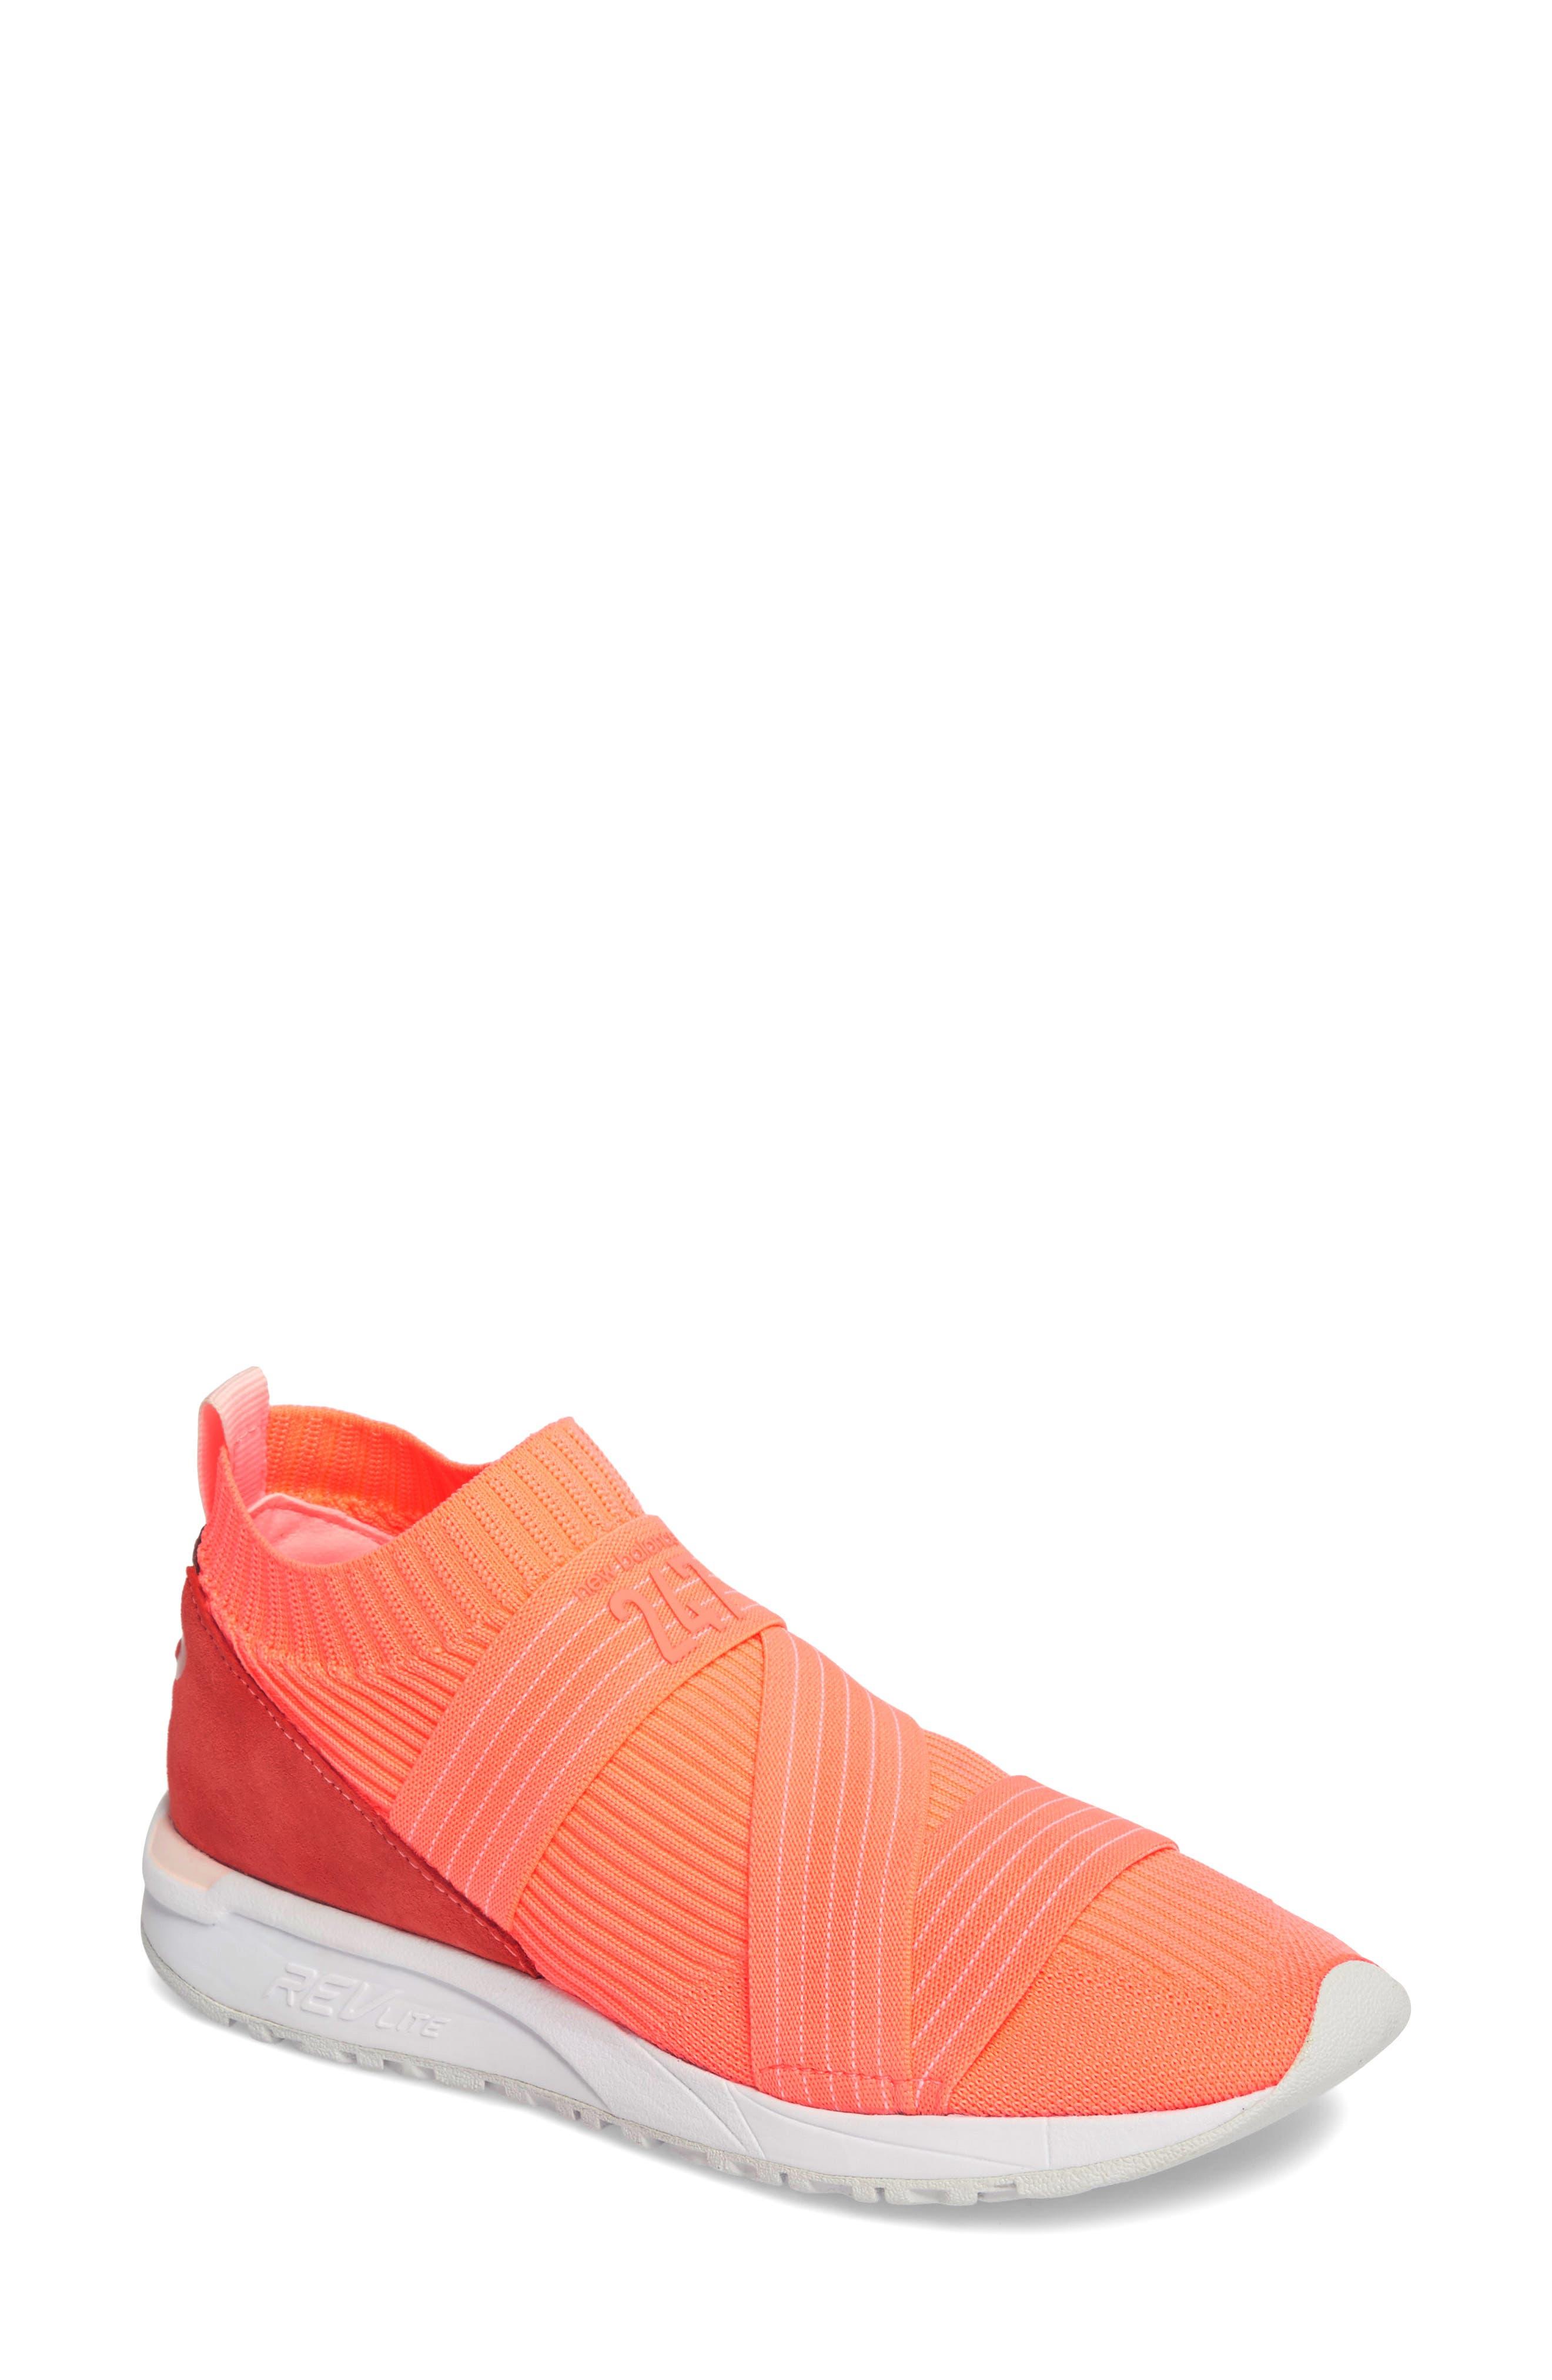 247 Knit Sneaker,                             Main thumbnail 2, color,